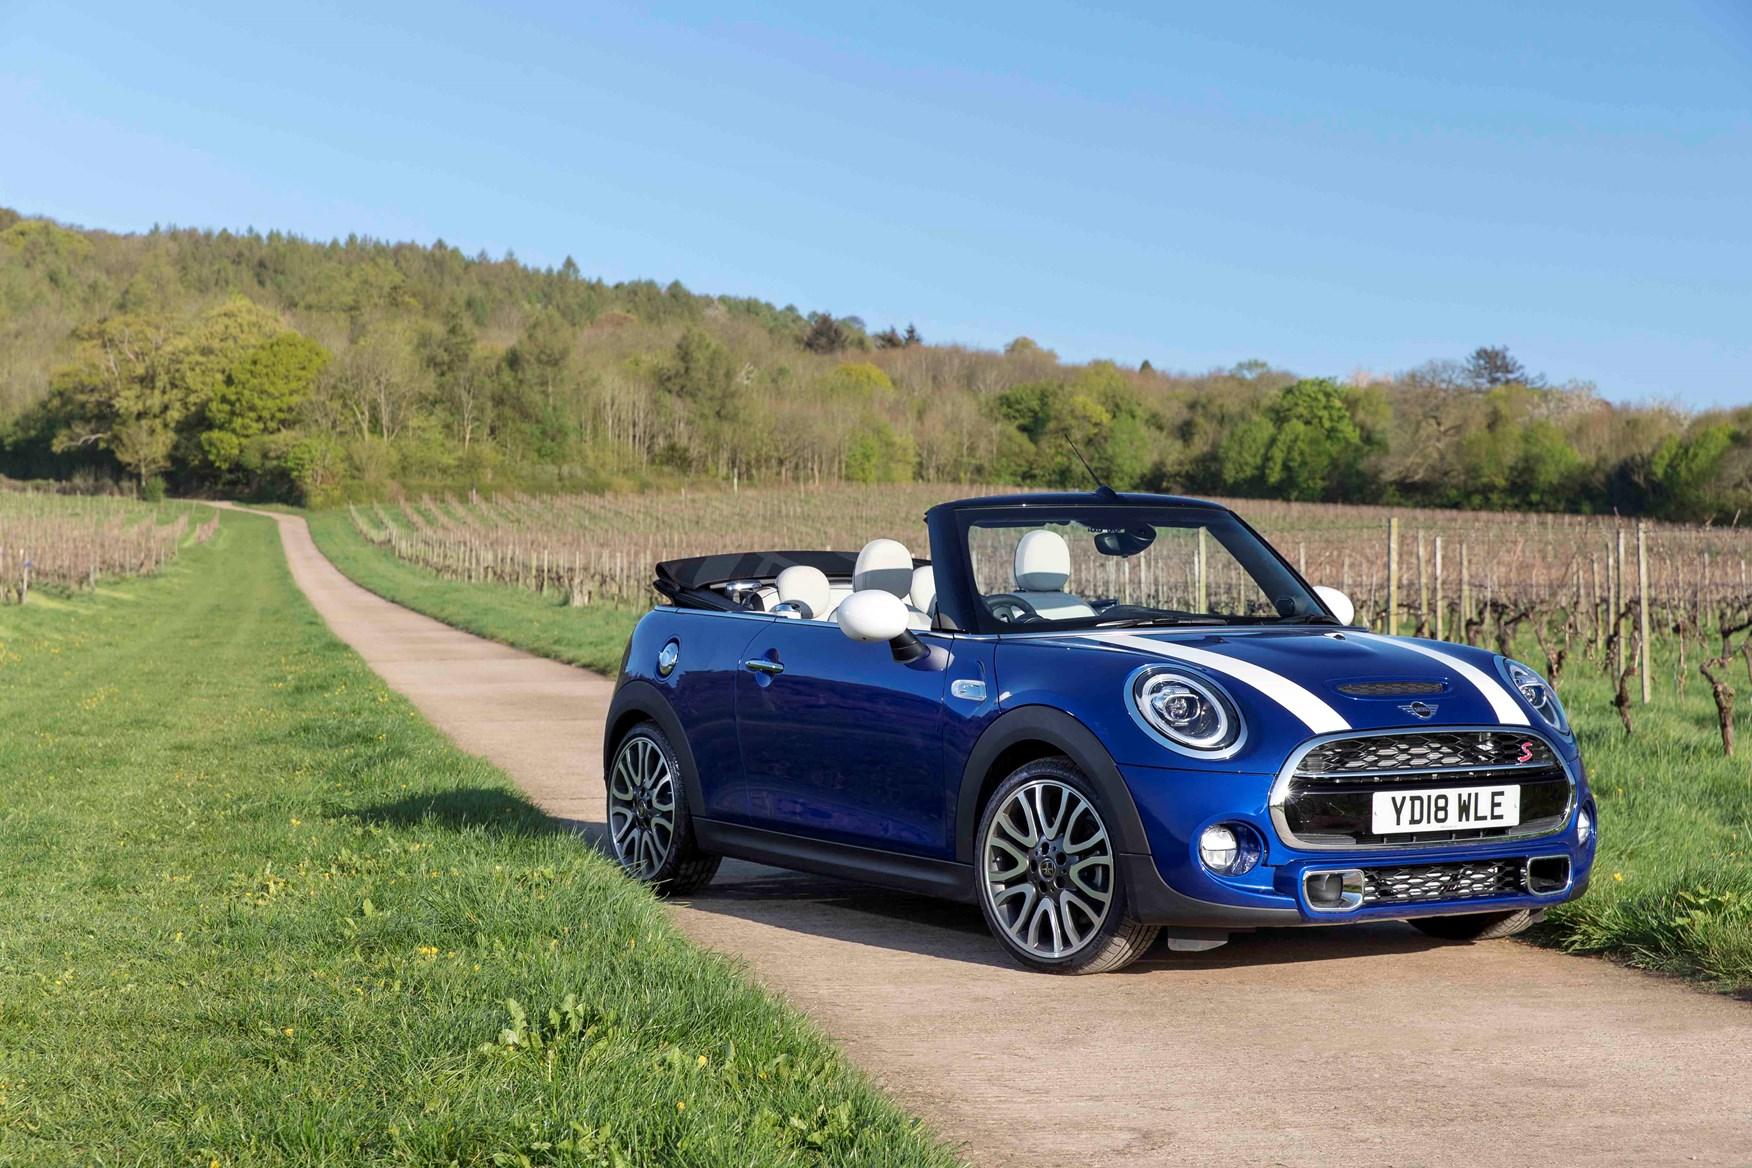 The Best Cheap Convertible Cars 2020